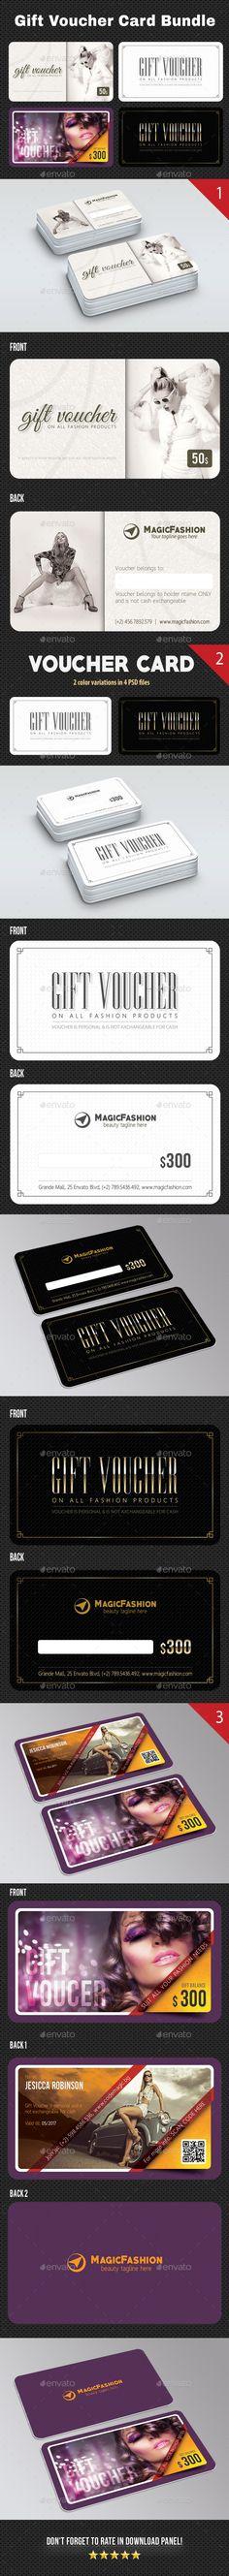 Business Gift Card Voucher Fonts-logos-icons Pinterest Print - payment voucher template